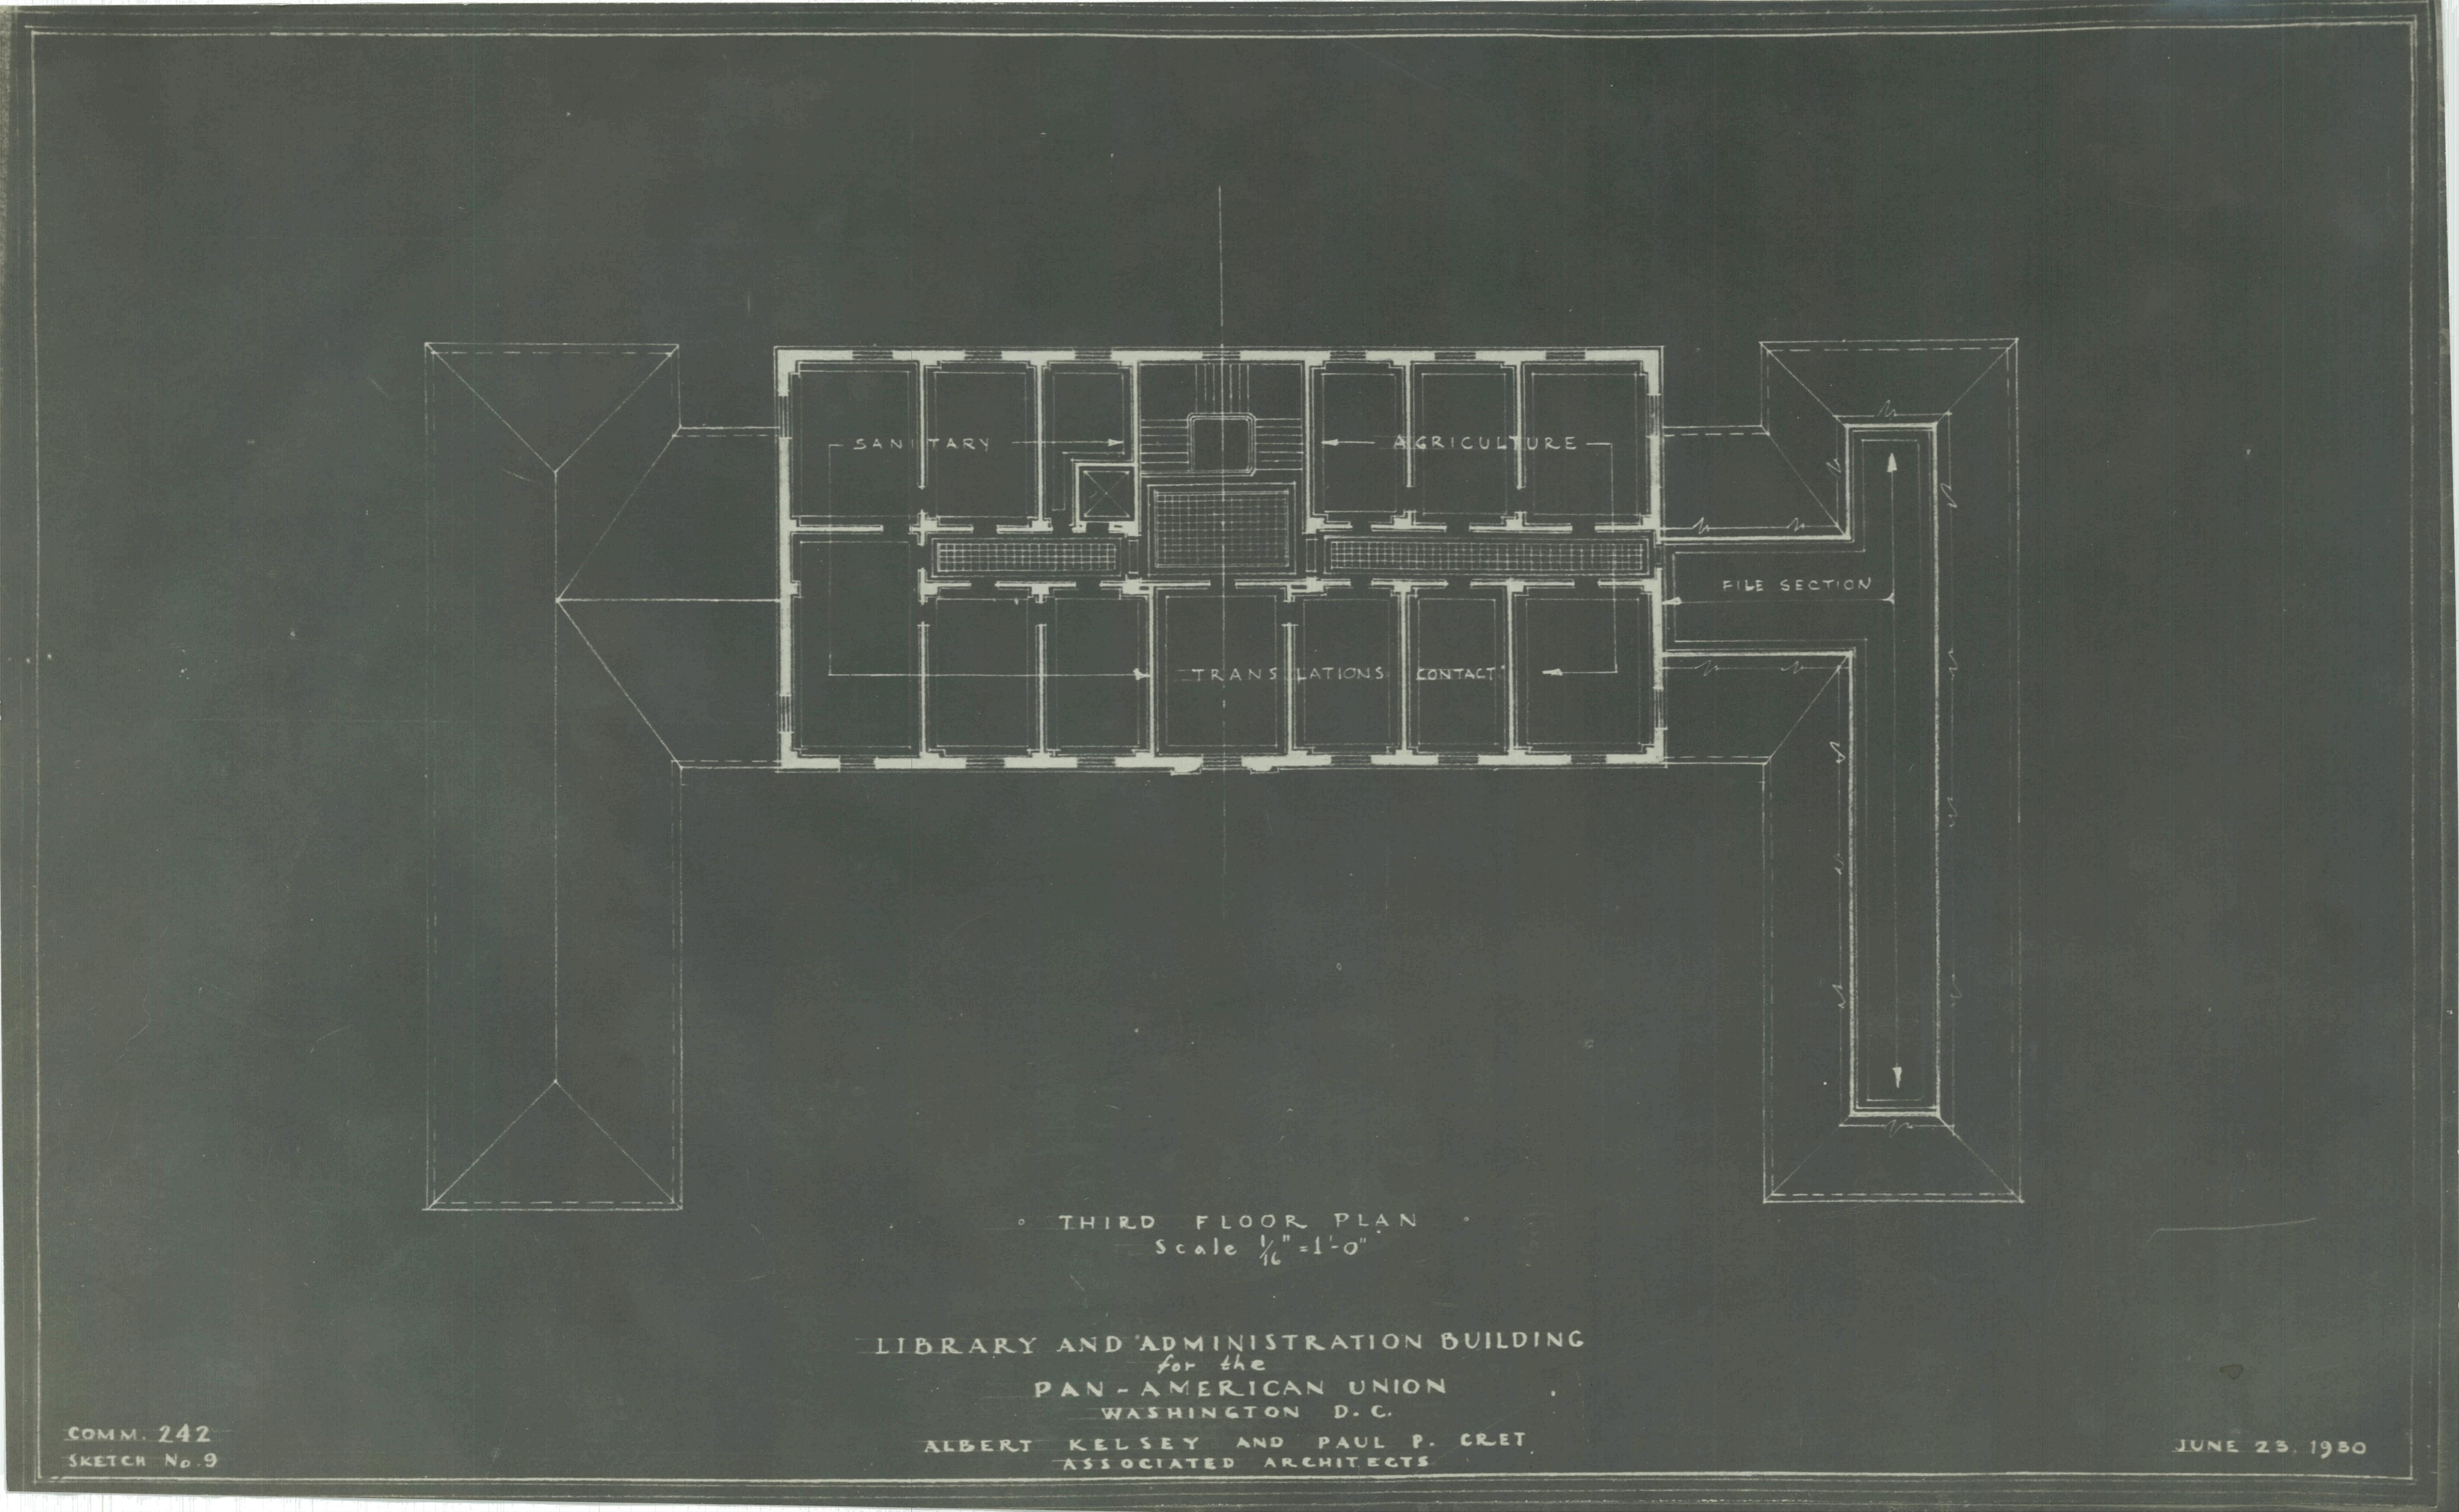 Pan-American Union Third Floor Plan